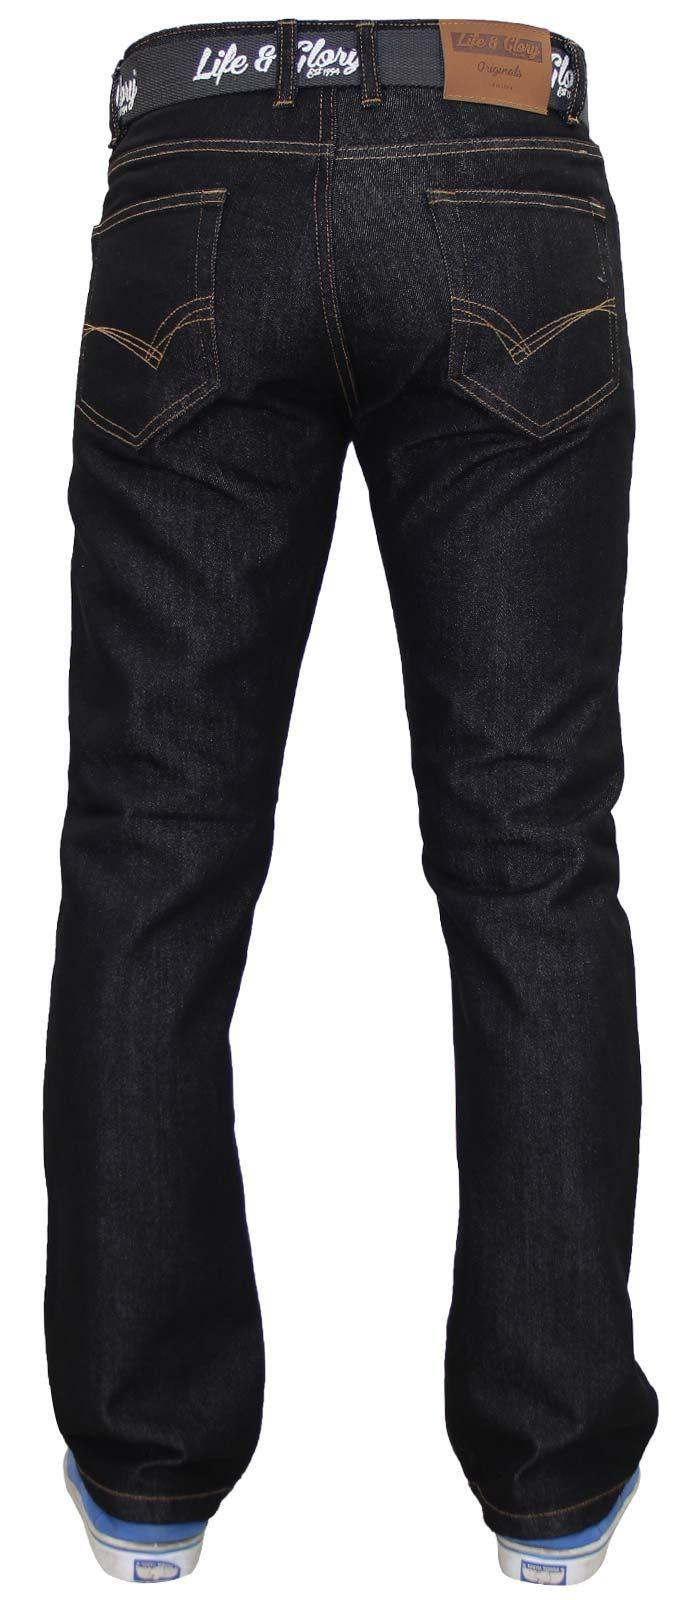 Mens-Regular-Fit-Jeans-Straight-Leg-Denim-Pants-Casual-Trousers-With-Free-Belt thumbnail 6